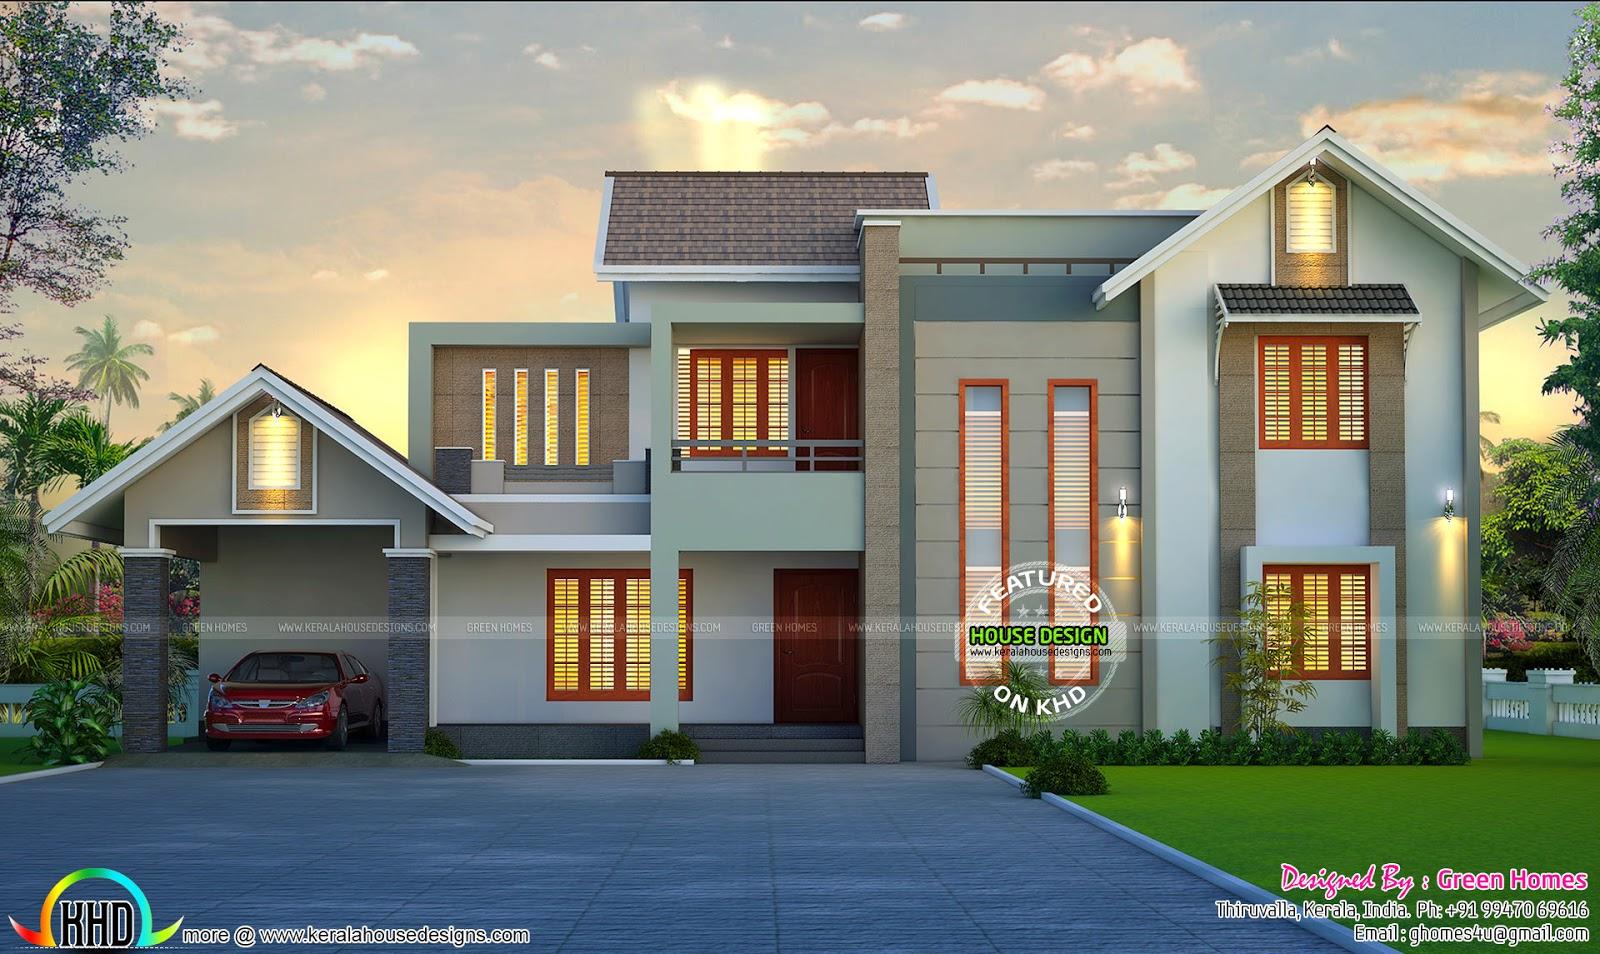 Beautiful home design by Green Homes Thiruvalla  Kerala